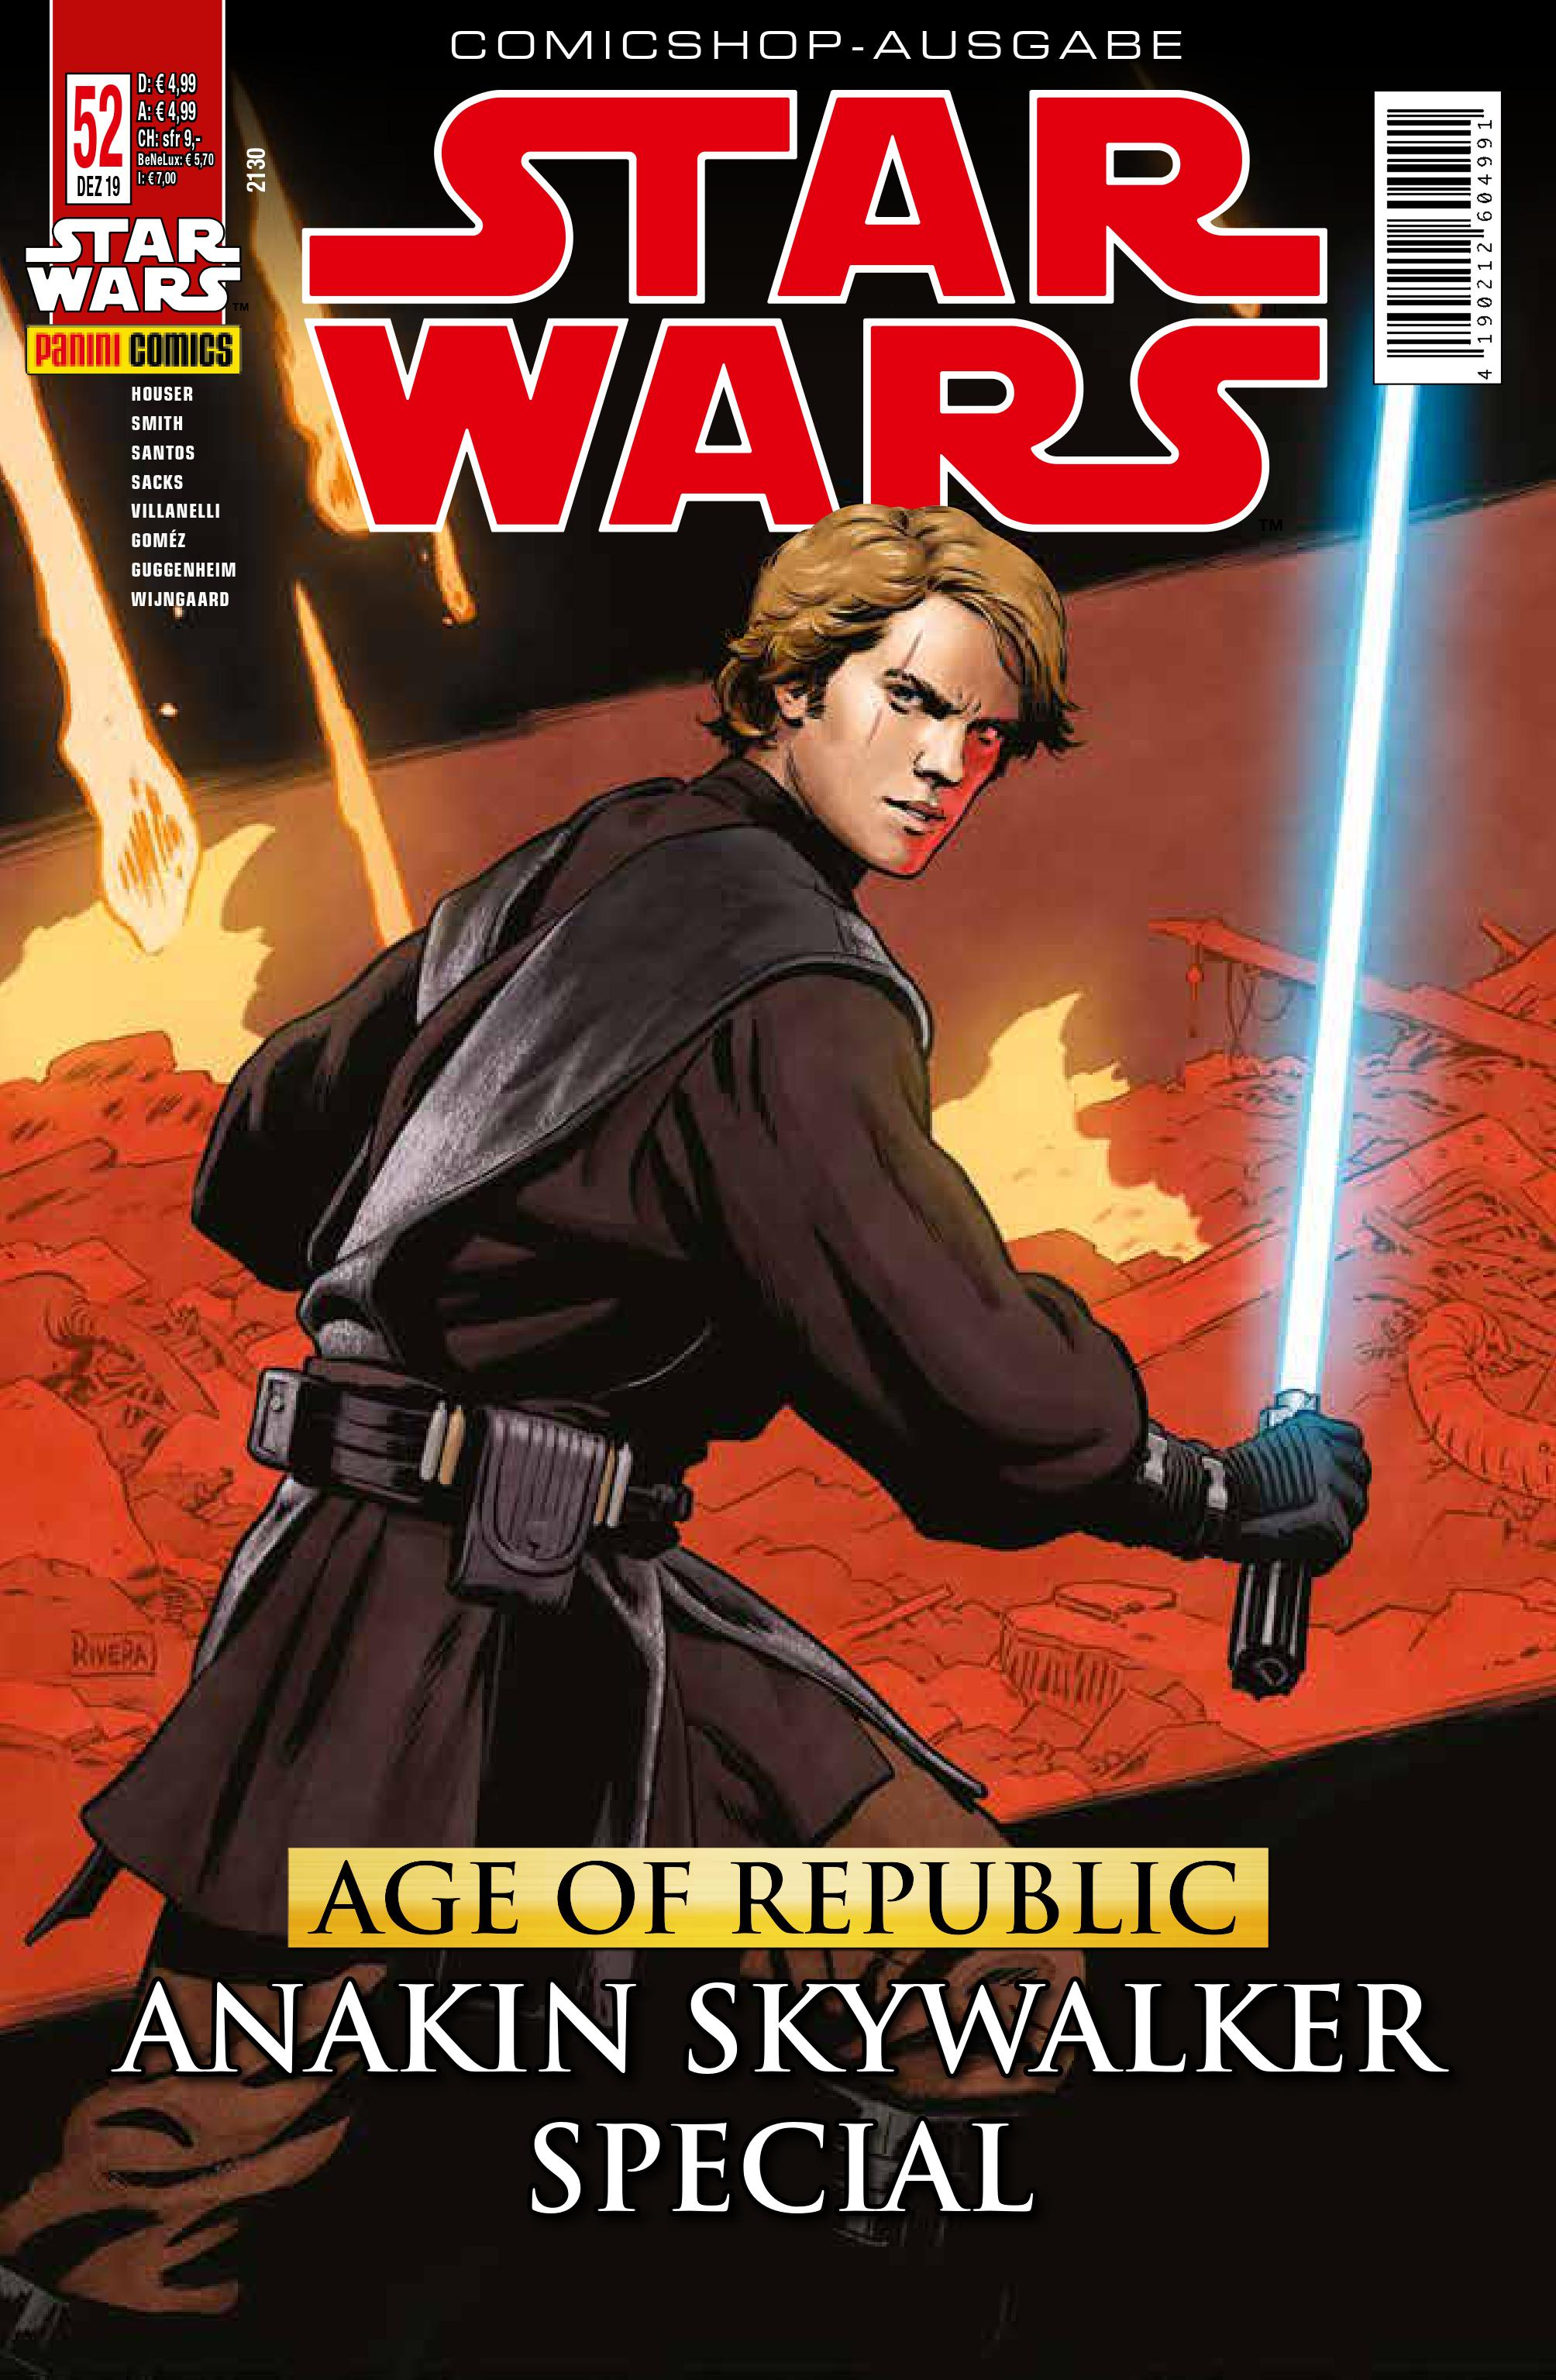 Star Wars #52 (Comicshop-Ausgabe) (20.11.2019)